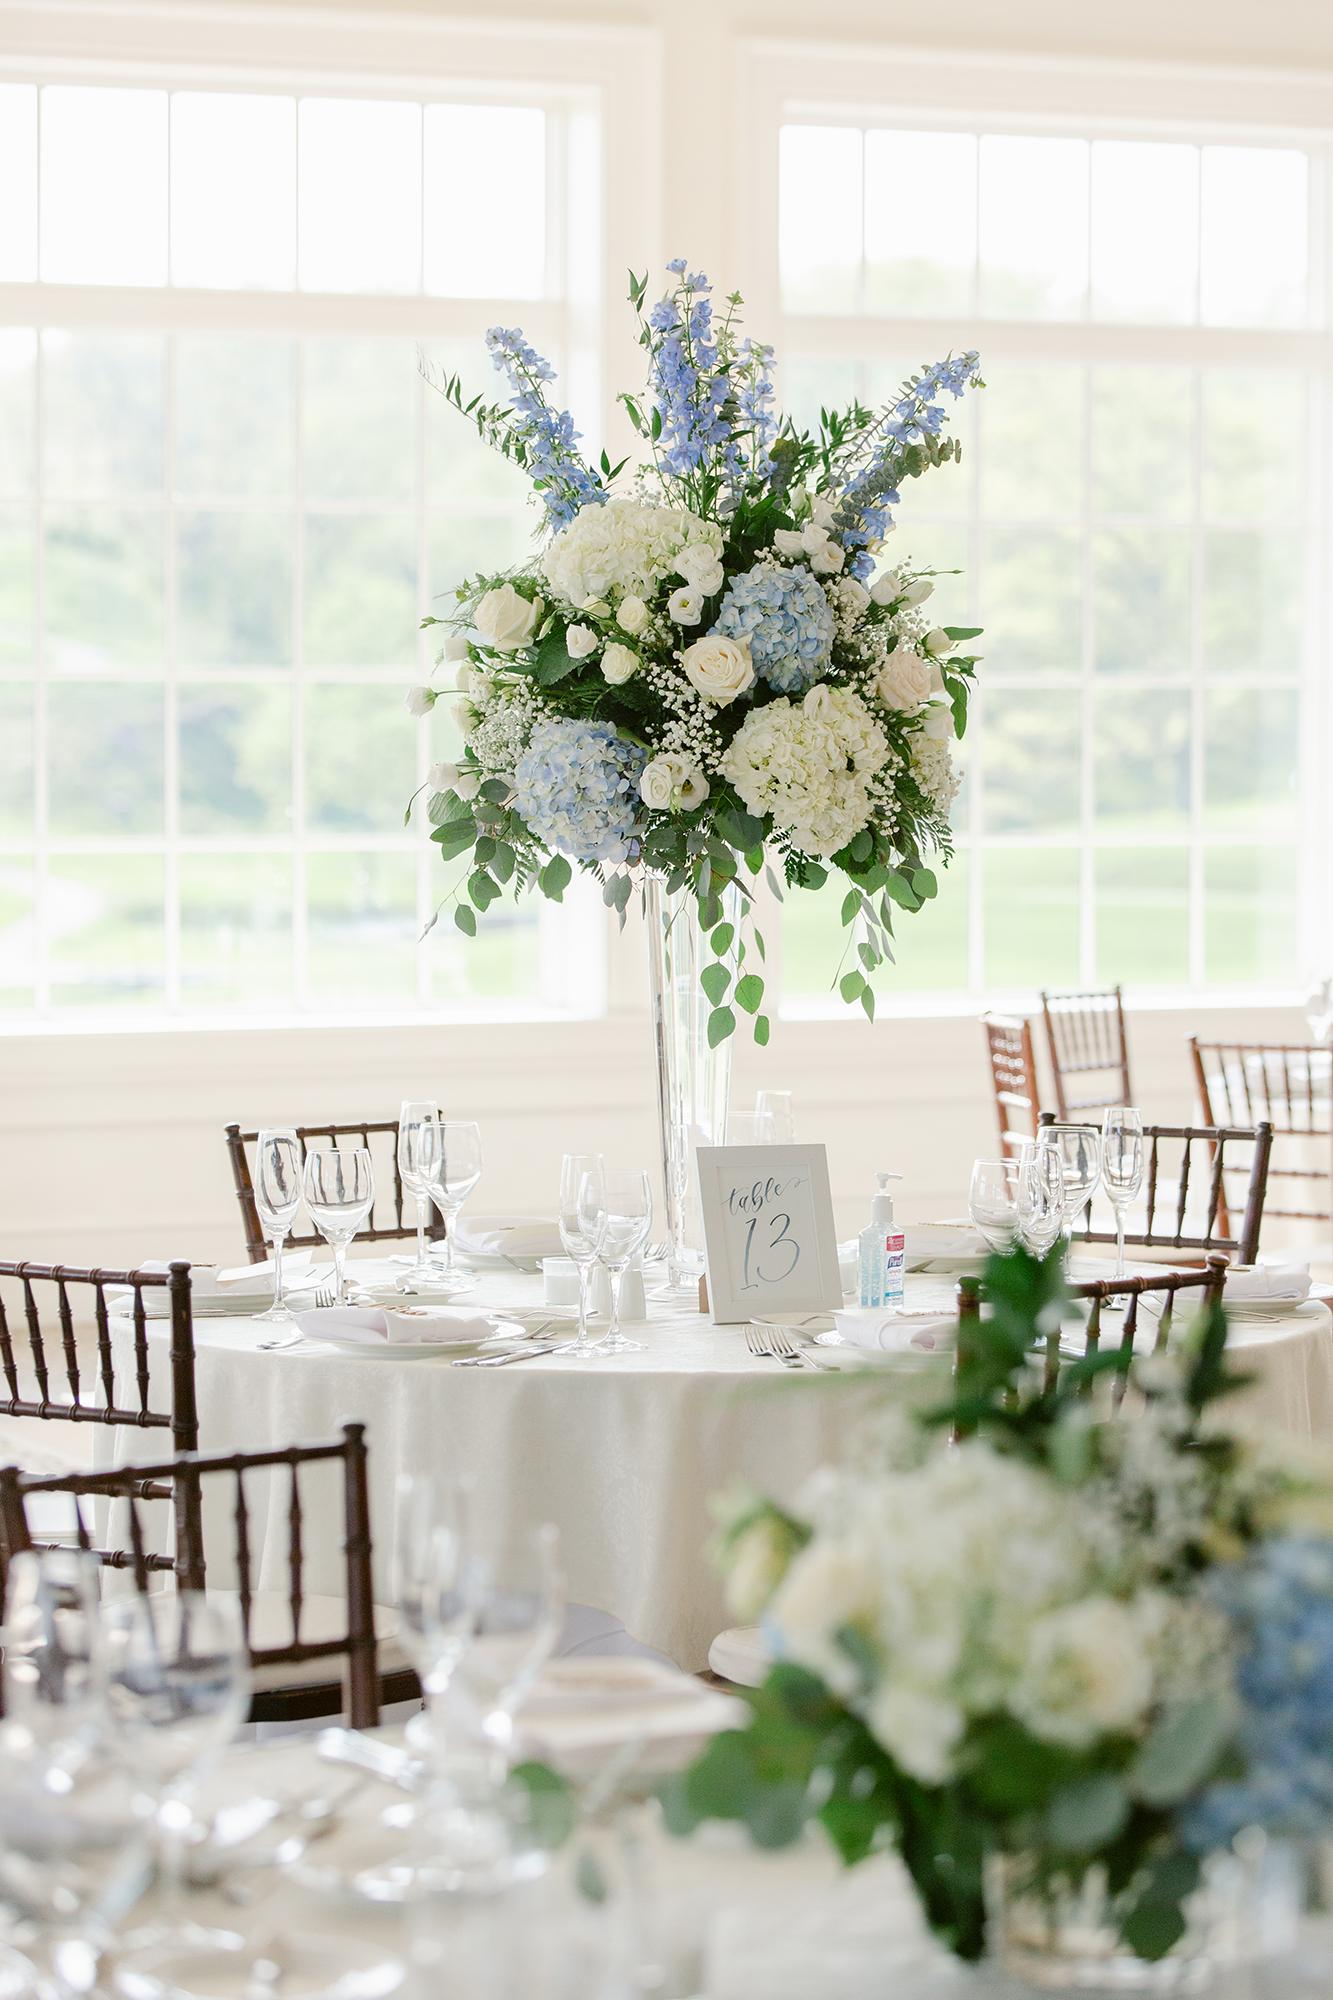 Sam Allen Creates Watercolor Table Number Sign for Wedding Reception Dinner Tablescape Katie+Mark-Wedding-719 Lauren Kearns Photography